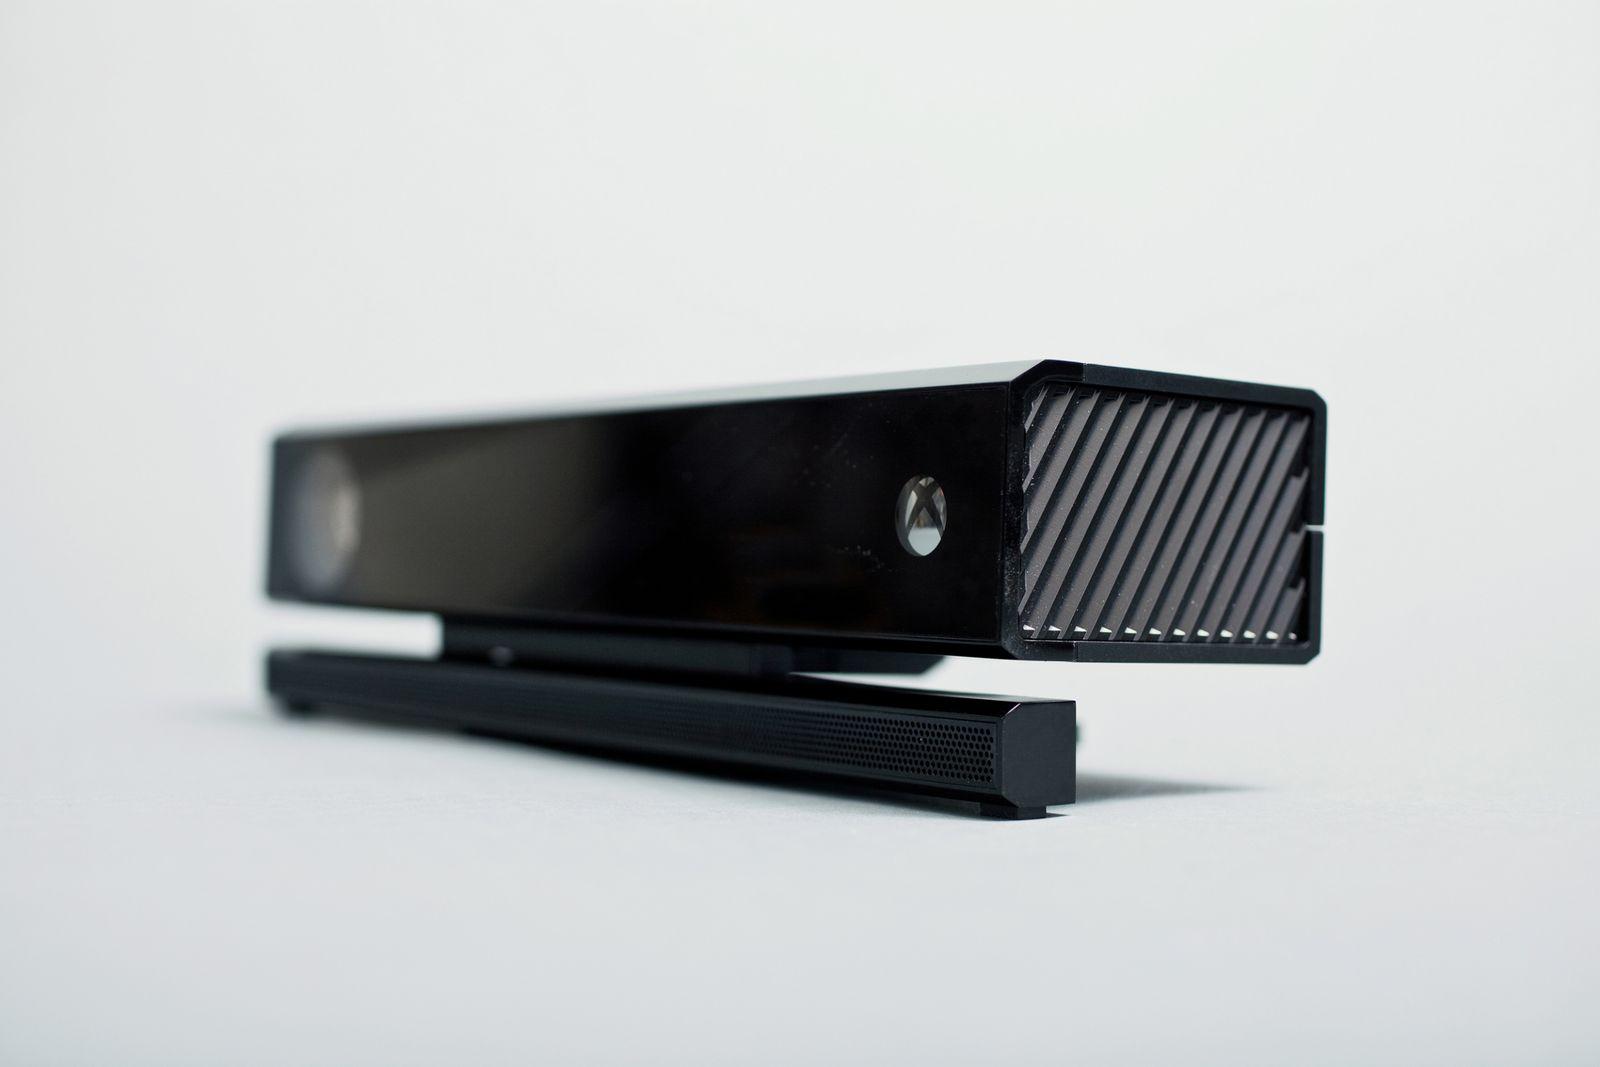 Microsoft présente l'Xbox One